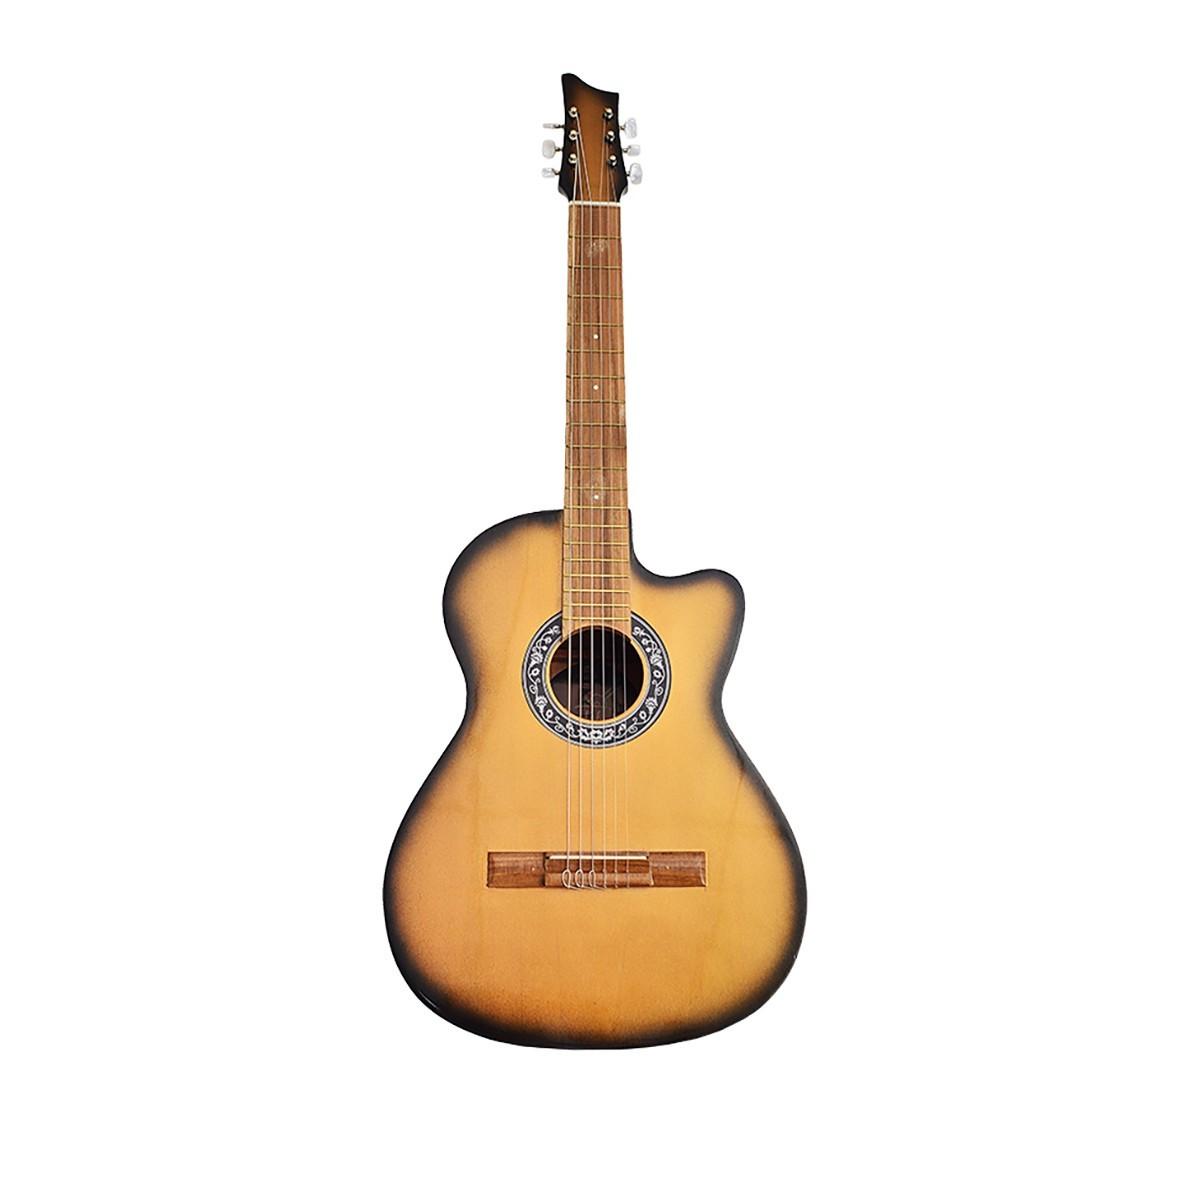 Guitarra acustica la clasica bucaramanga finos acabados for Guitarras la clasica